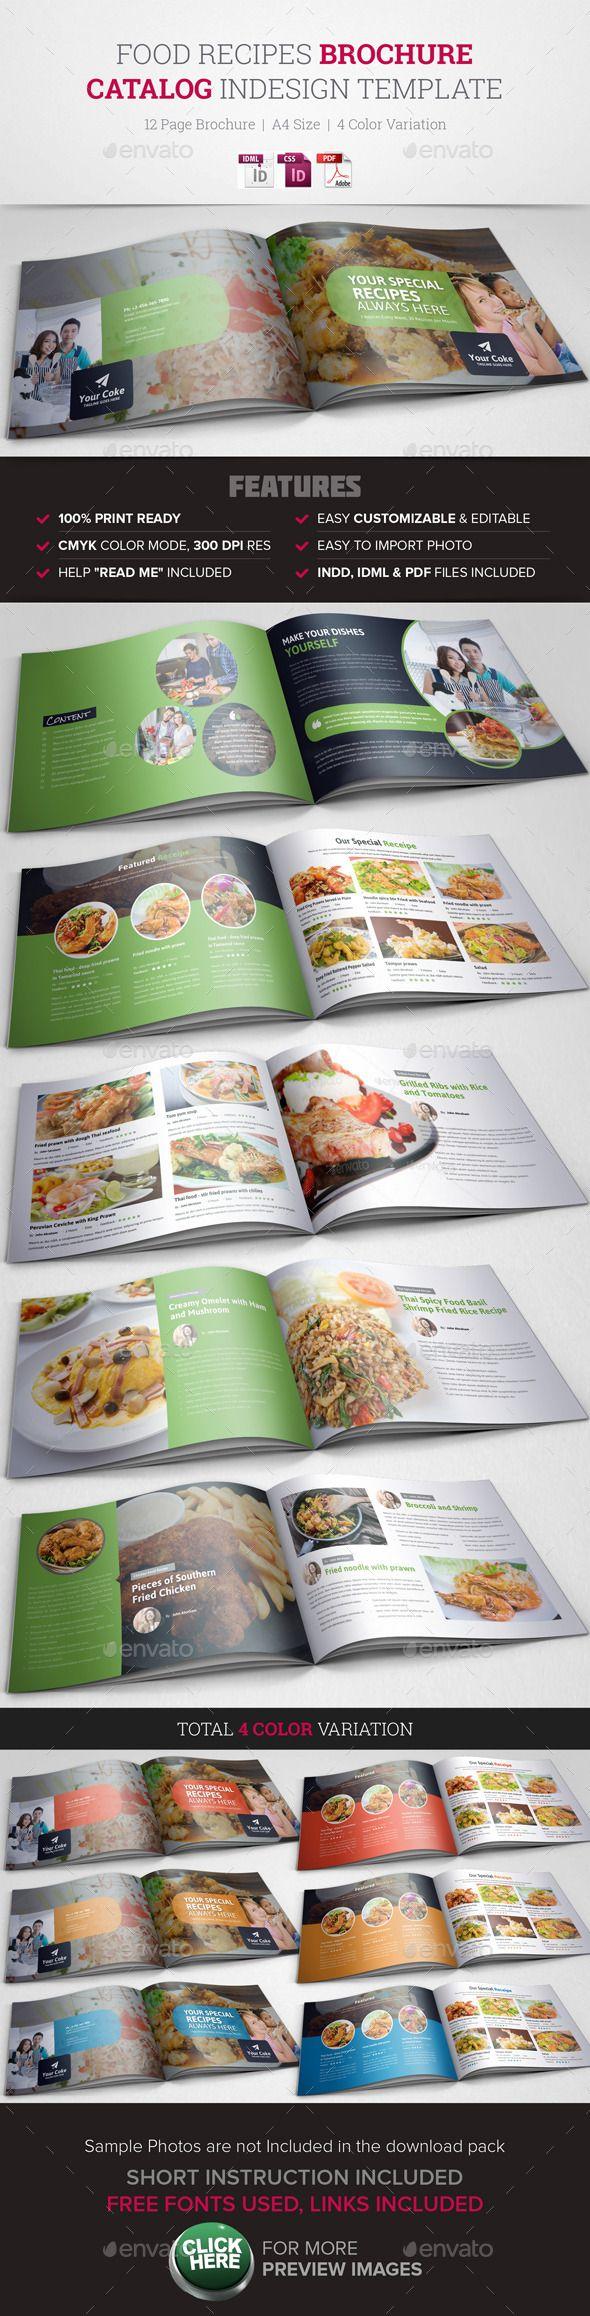 Food Recipes InDesign Brochure Catalog | Diseño editorial, Editorial ...